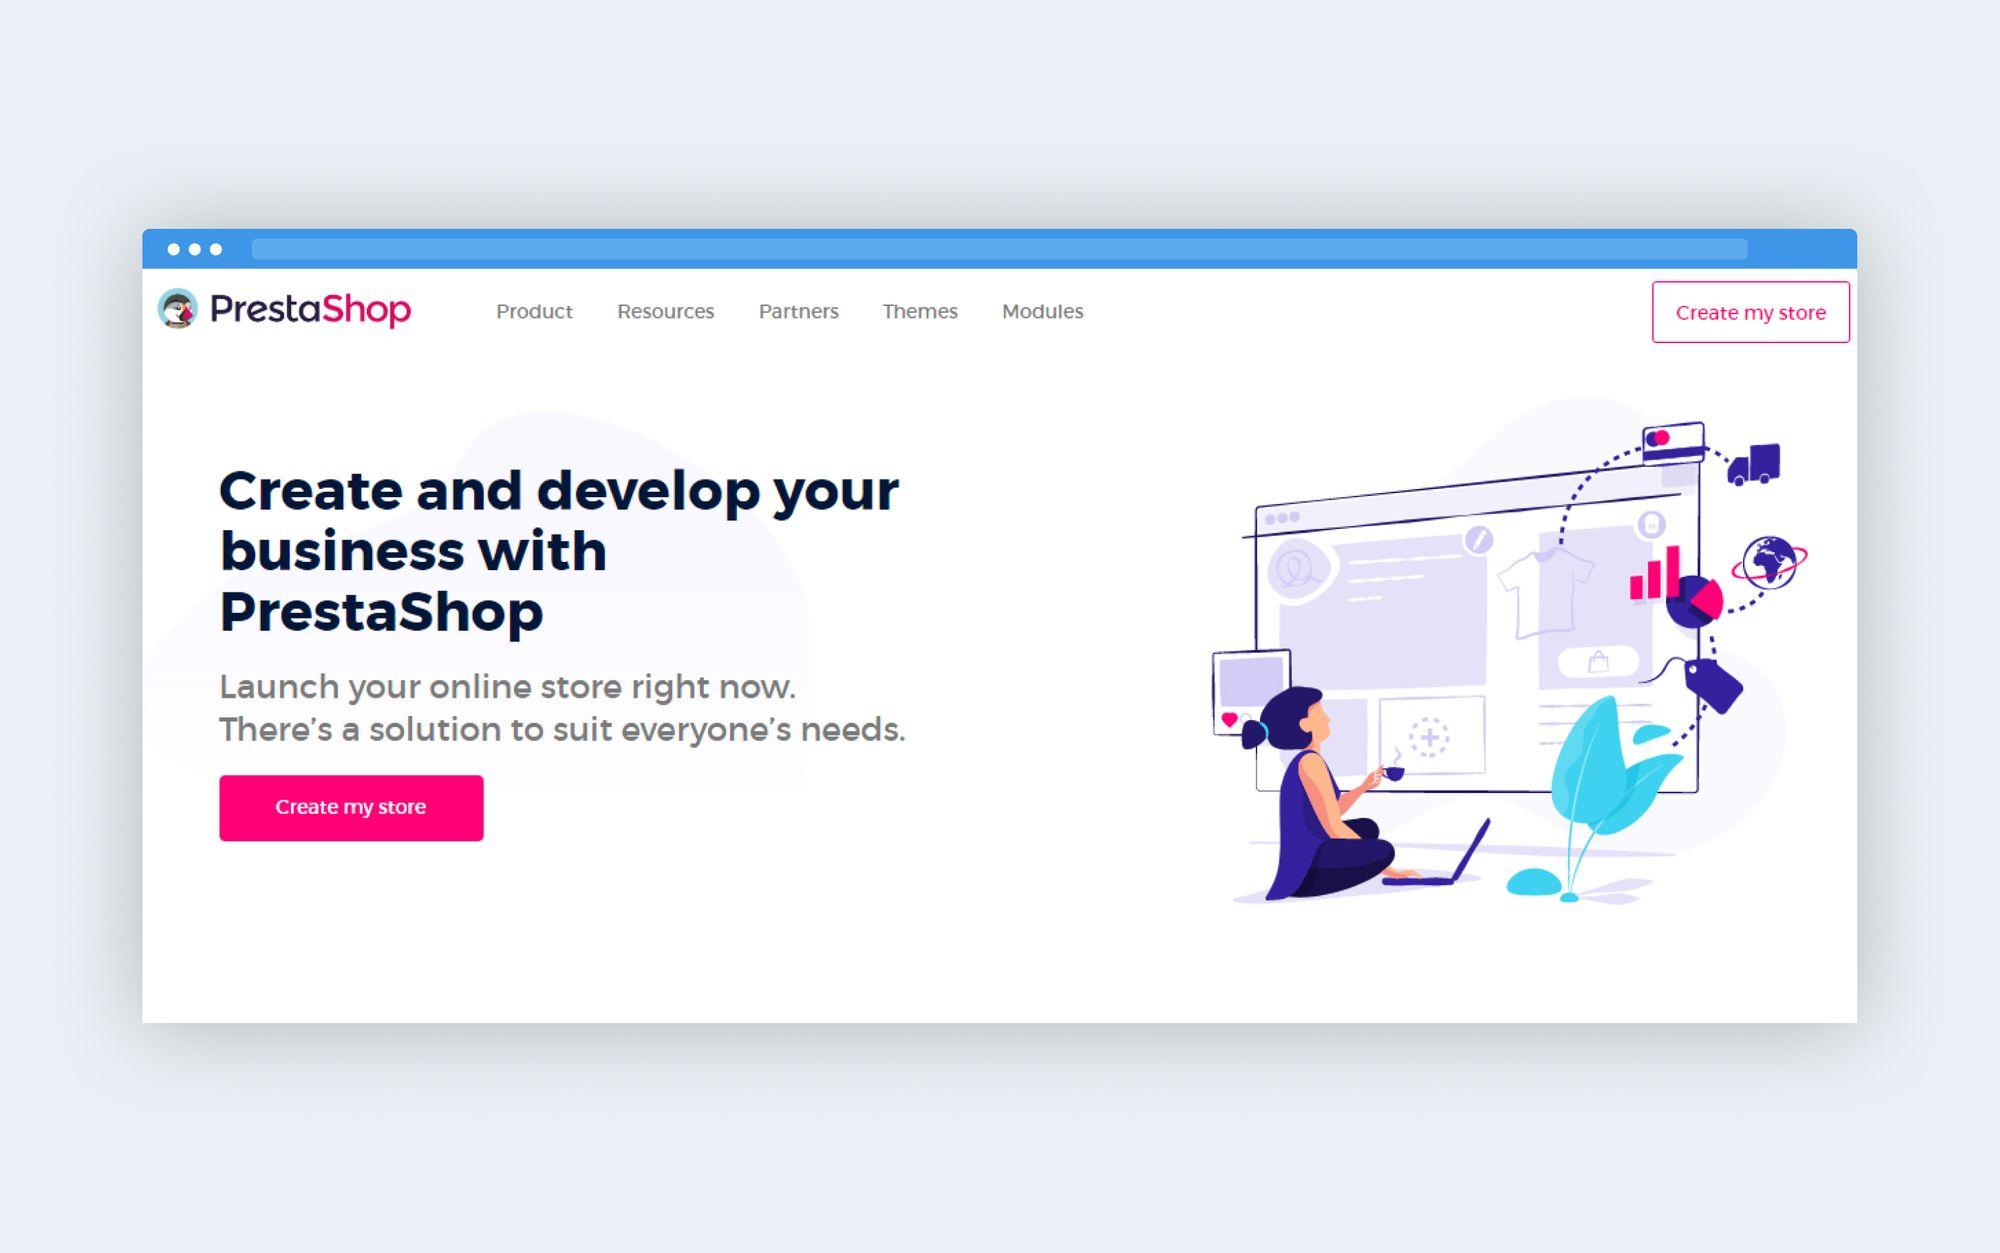 PrestaShop platform